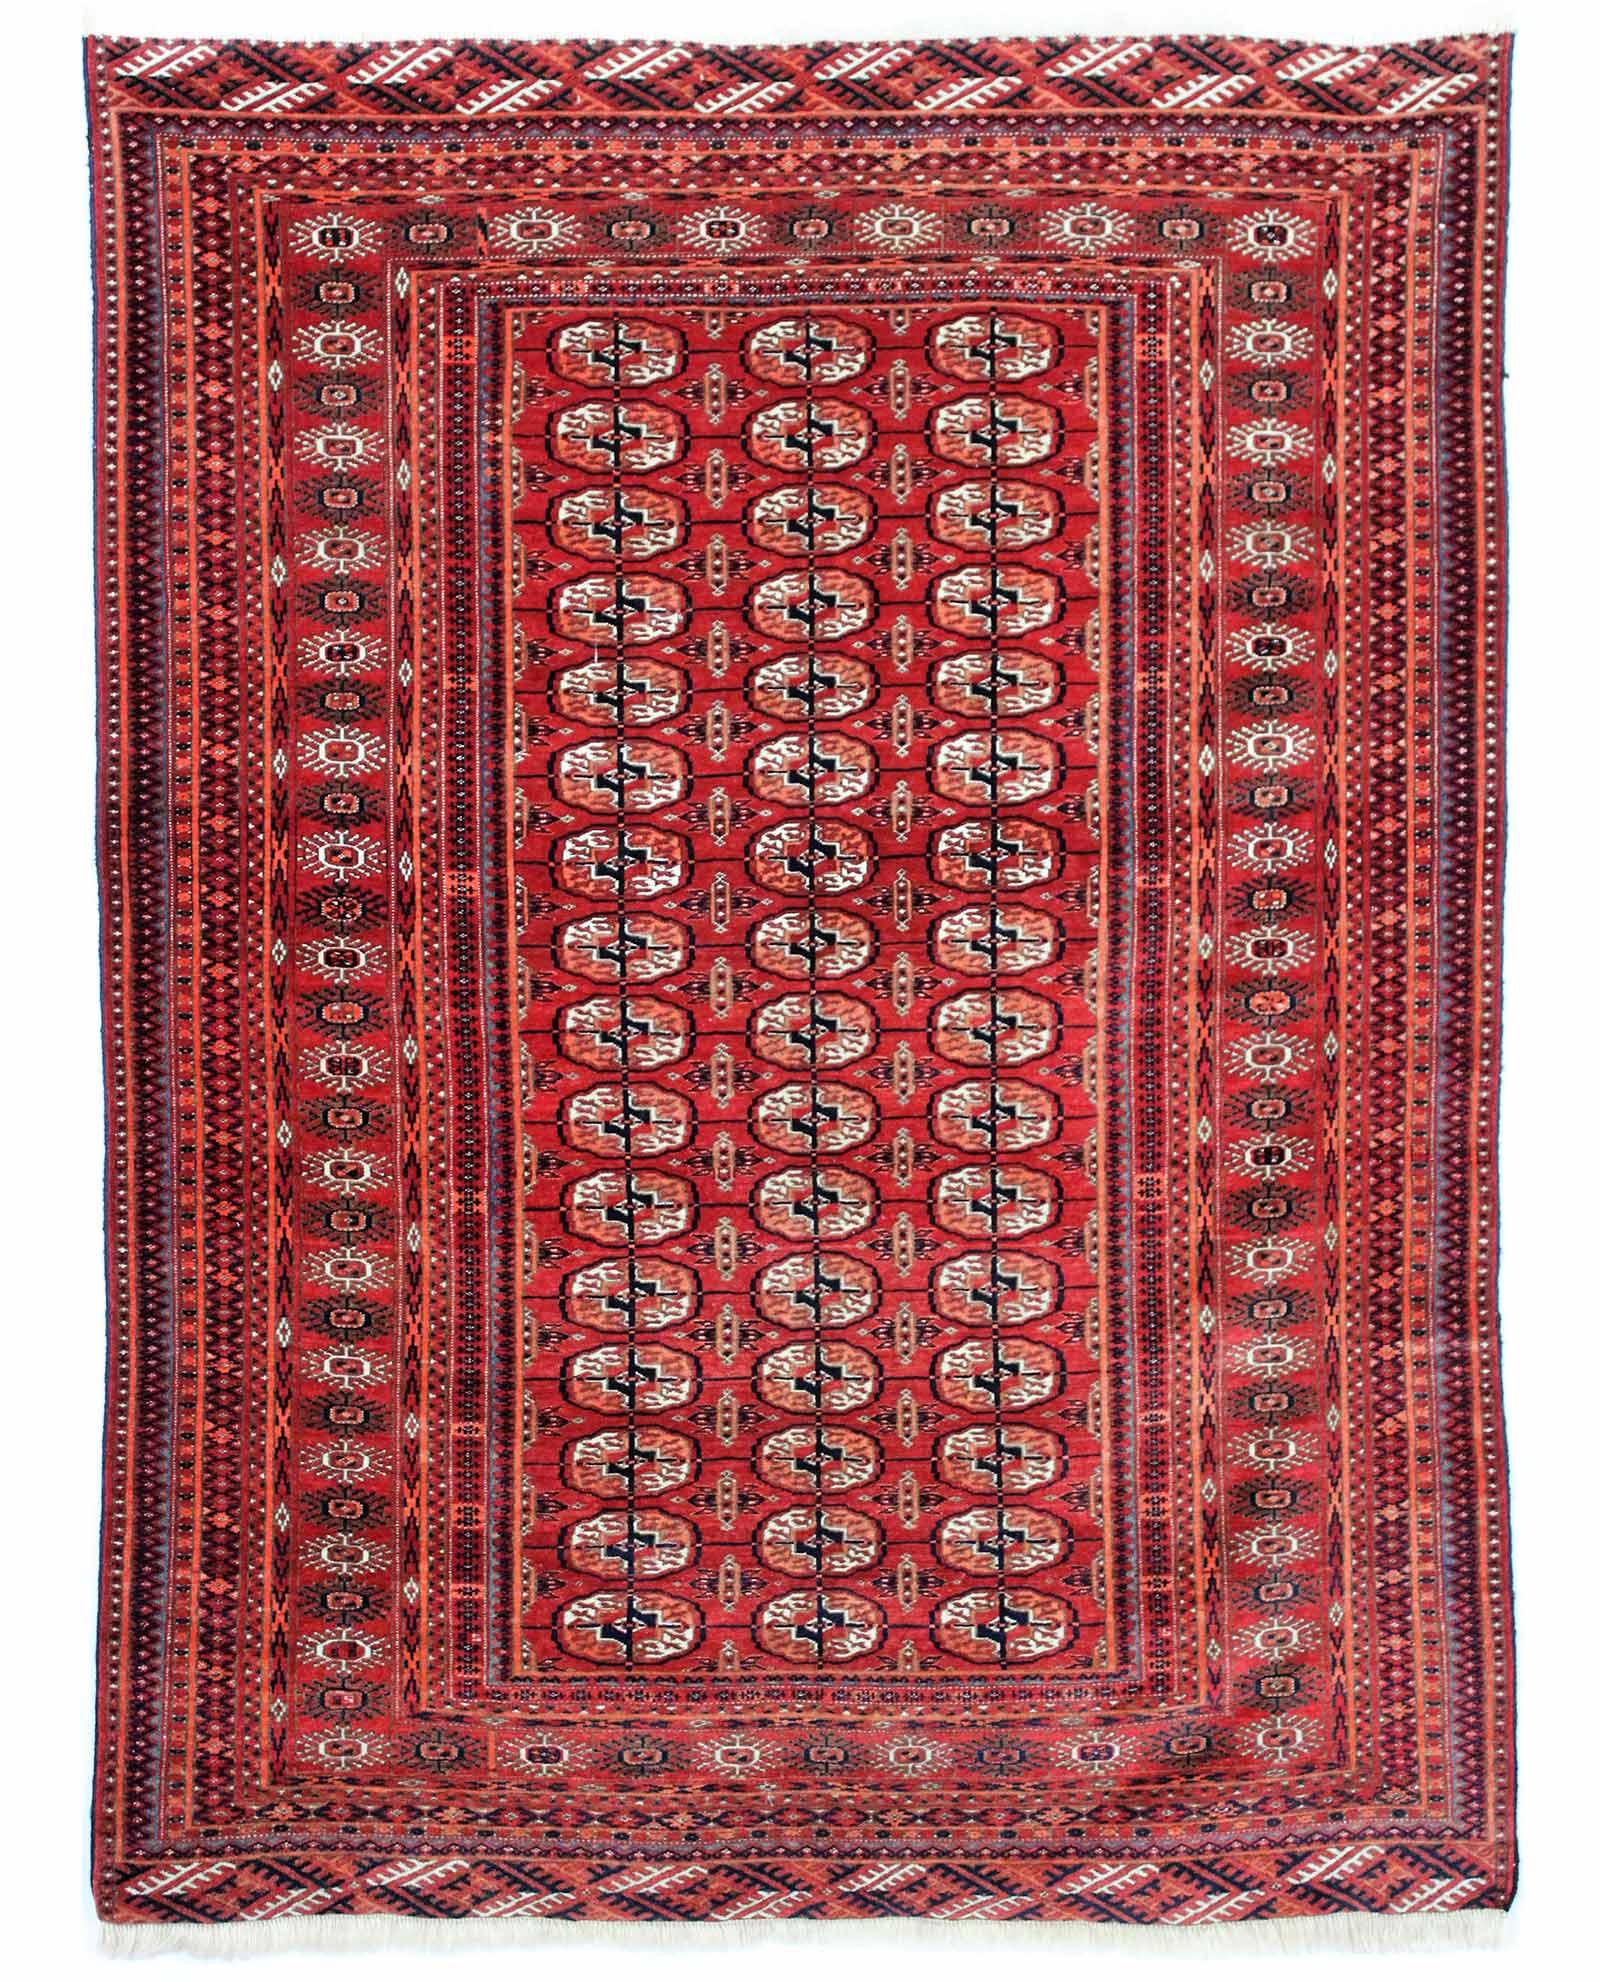 tapis du caucase bouccara p001 iranian carpet. Black Bedroom Furniture Sets. Home Design Ideas